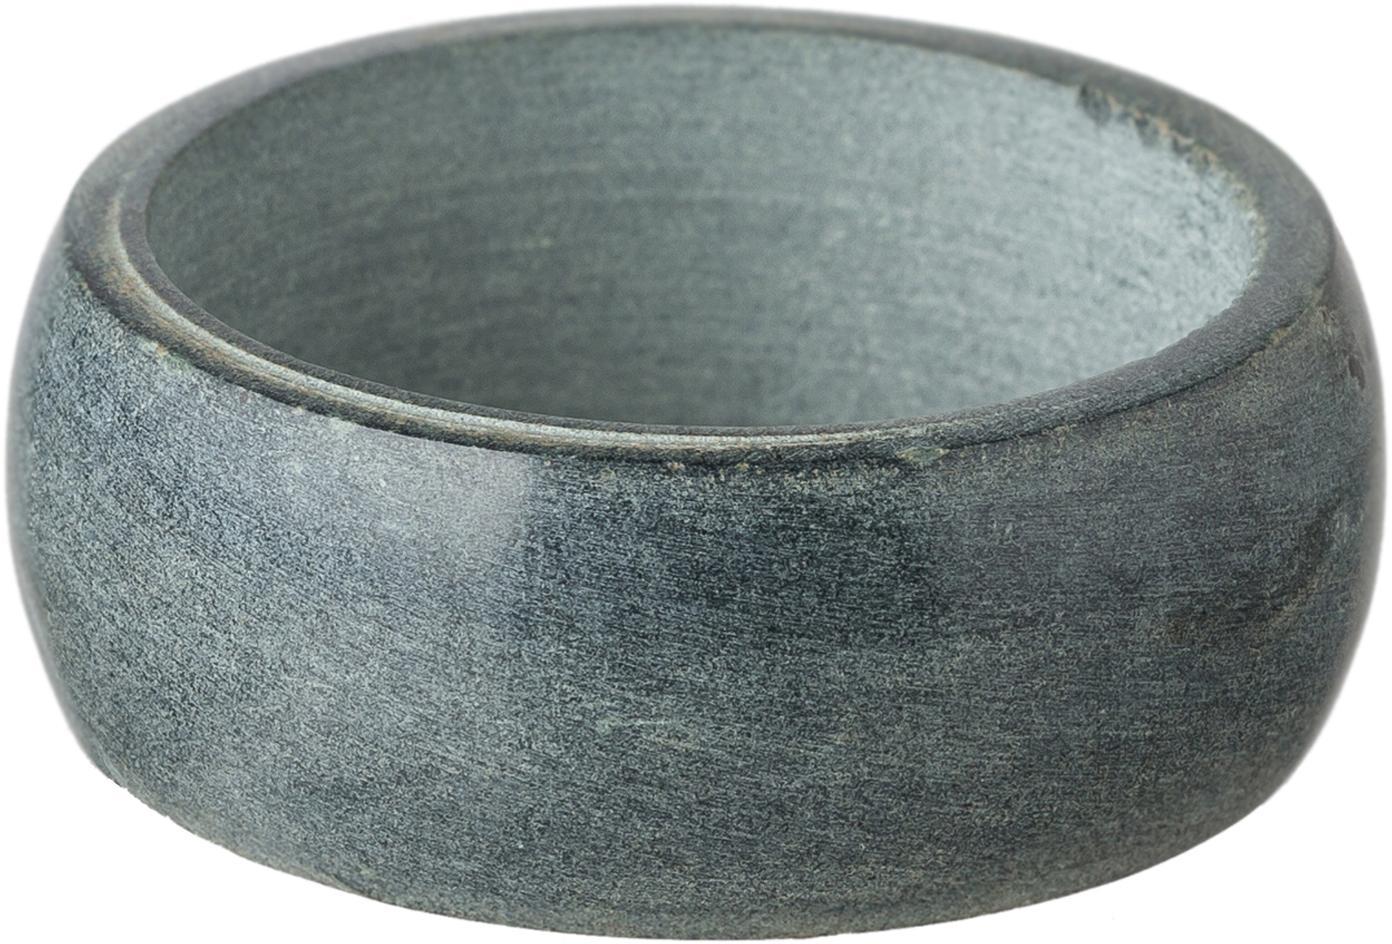 Servilleteros Soap Stone, 6uds., Esteatita, Gris antracita, Ø 5 x Al 2 cm